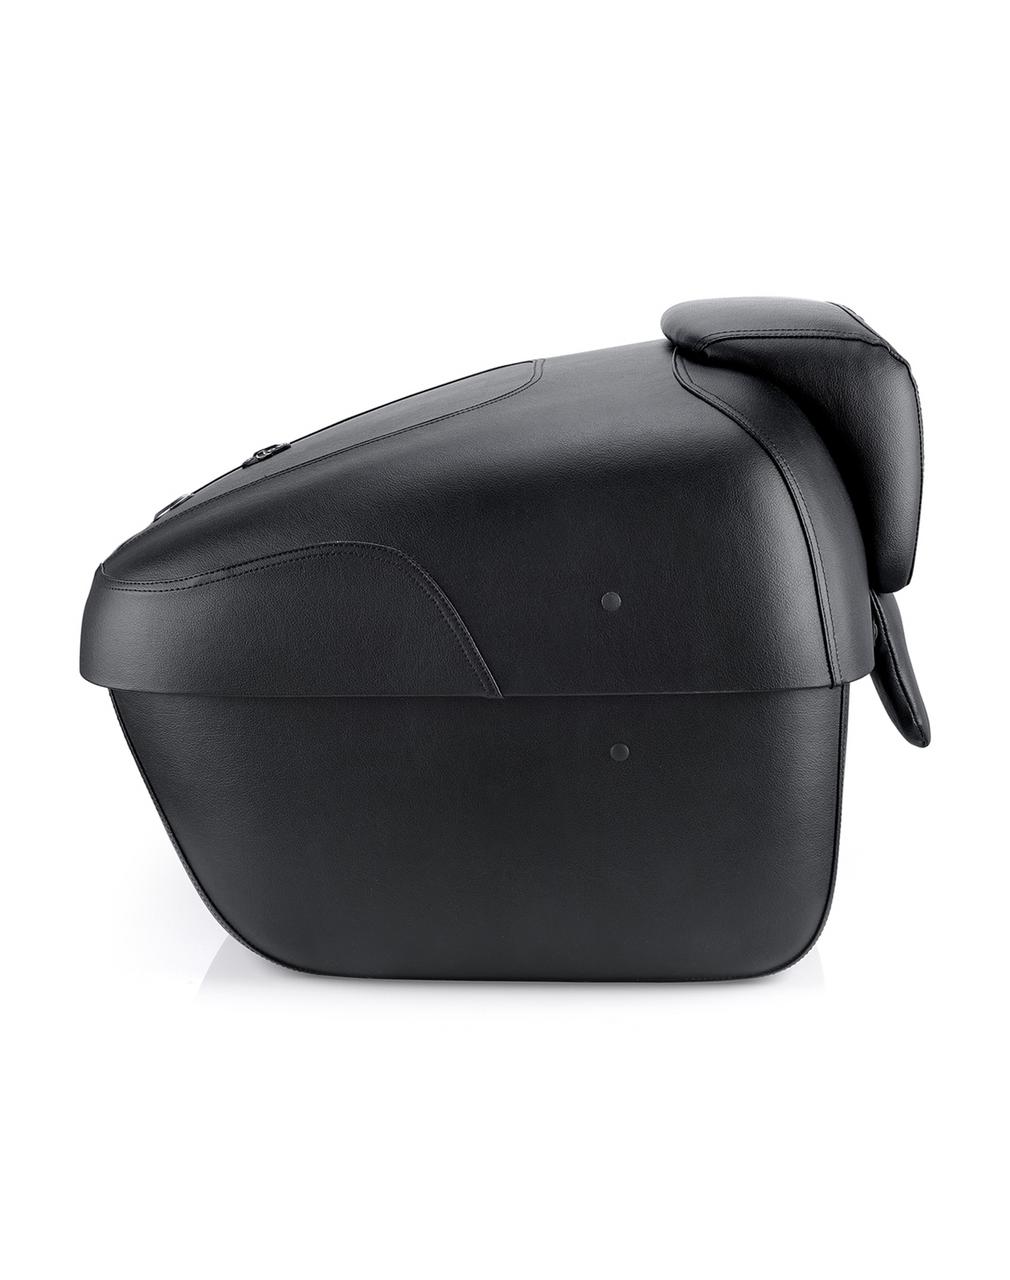 Suzuki Viking Premium Leather Wrapped Hard Trunk Side View